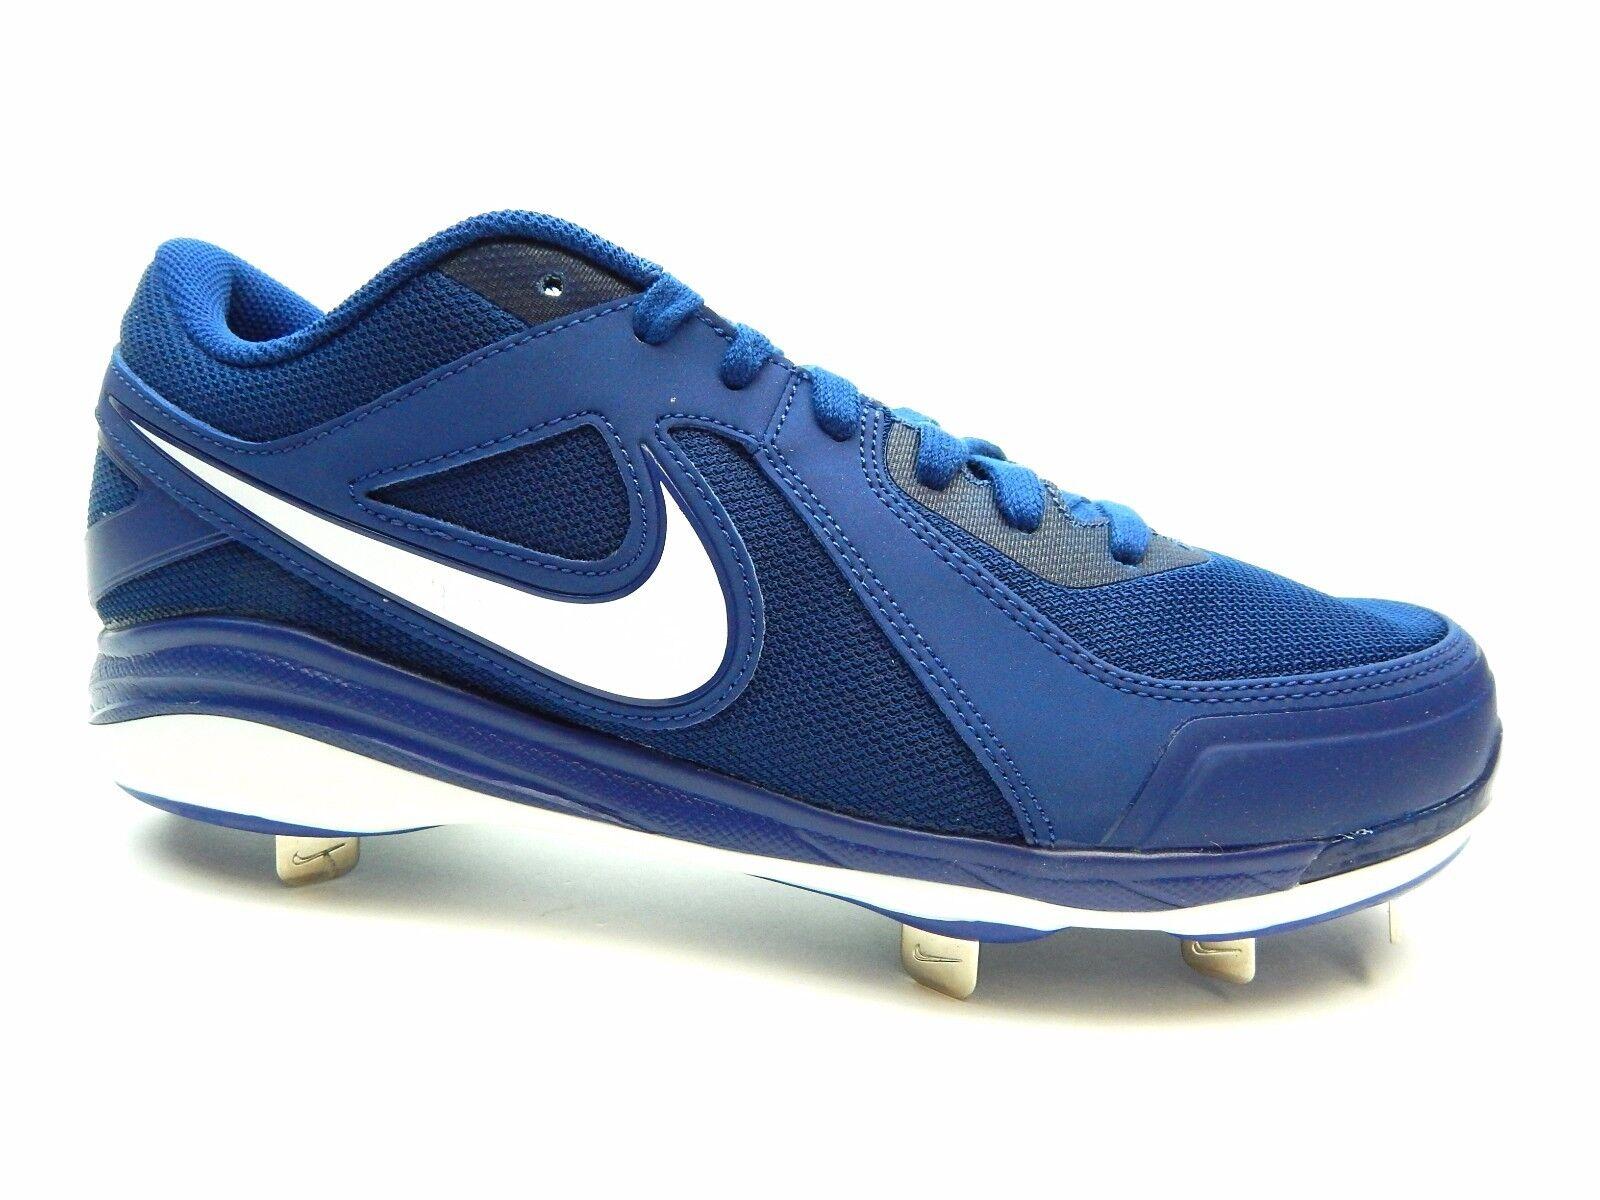 Nike Air MVP Pro Metal 524641 412 ROYAL WHITE MEN Baseball SIZE 10, 10.5 & 12 Great discount